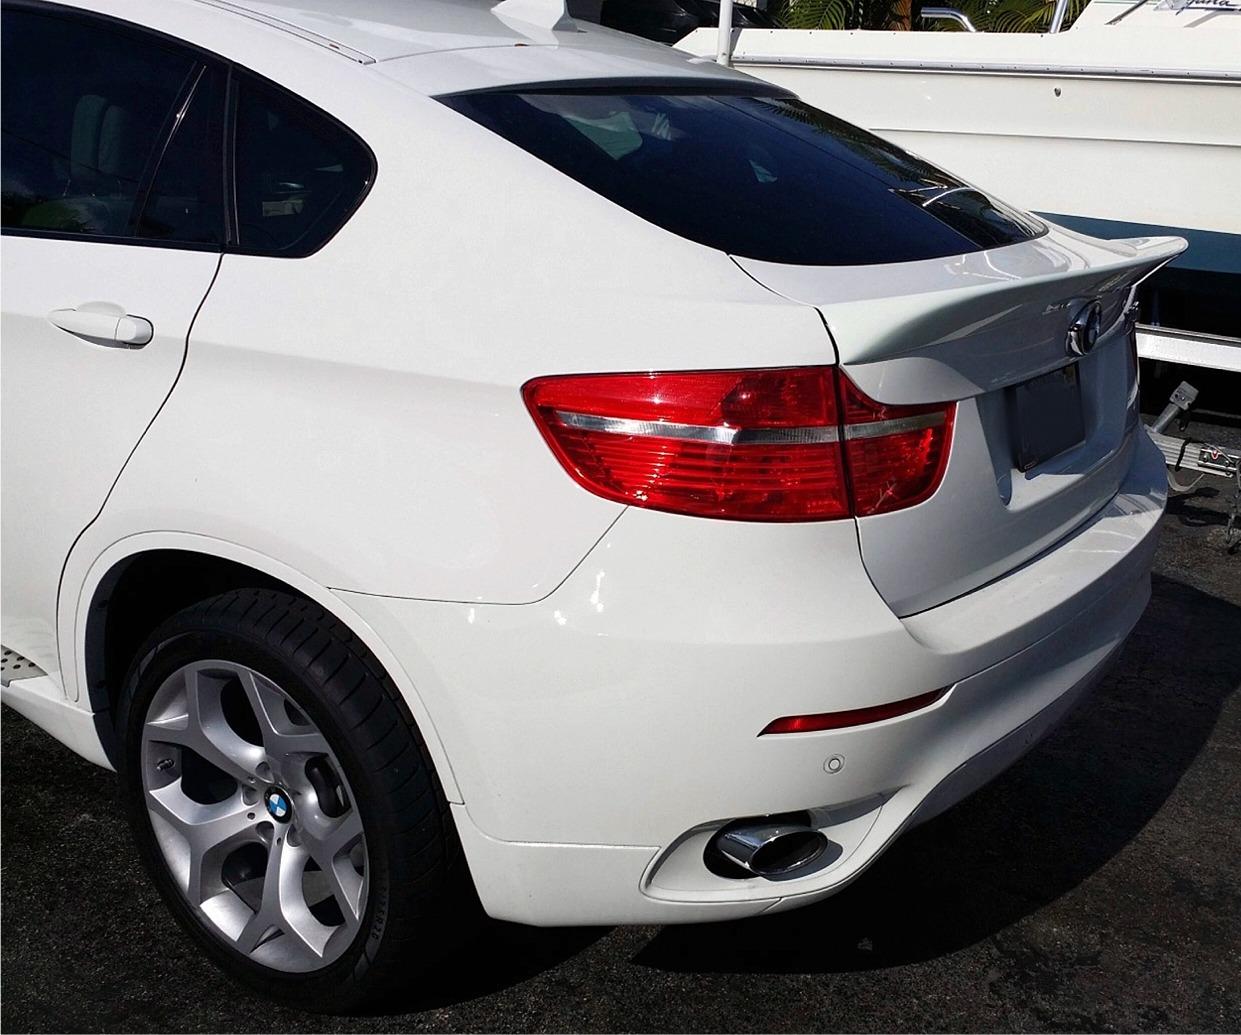 Bmw X6 Usa: 2008-2013 BMW X6 ACS Style Rear Lip Spoiler